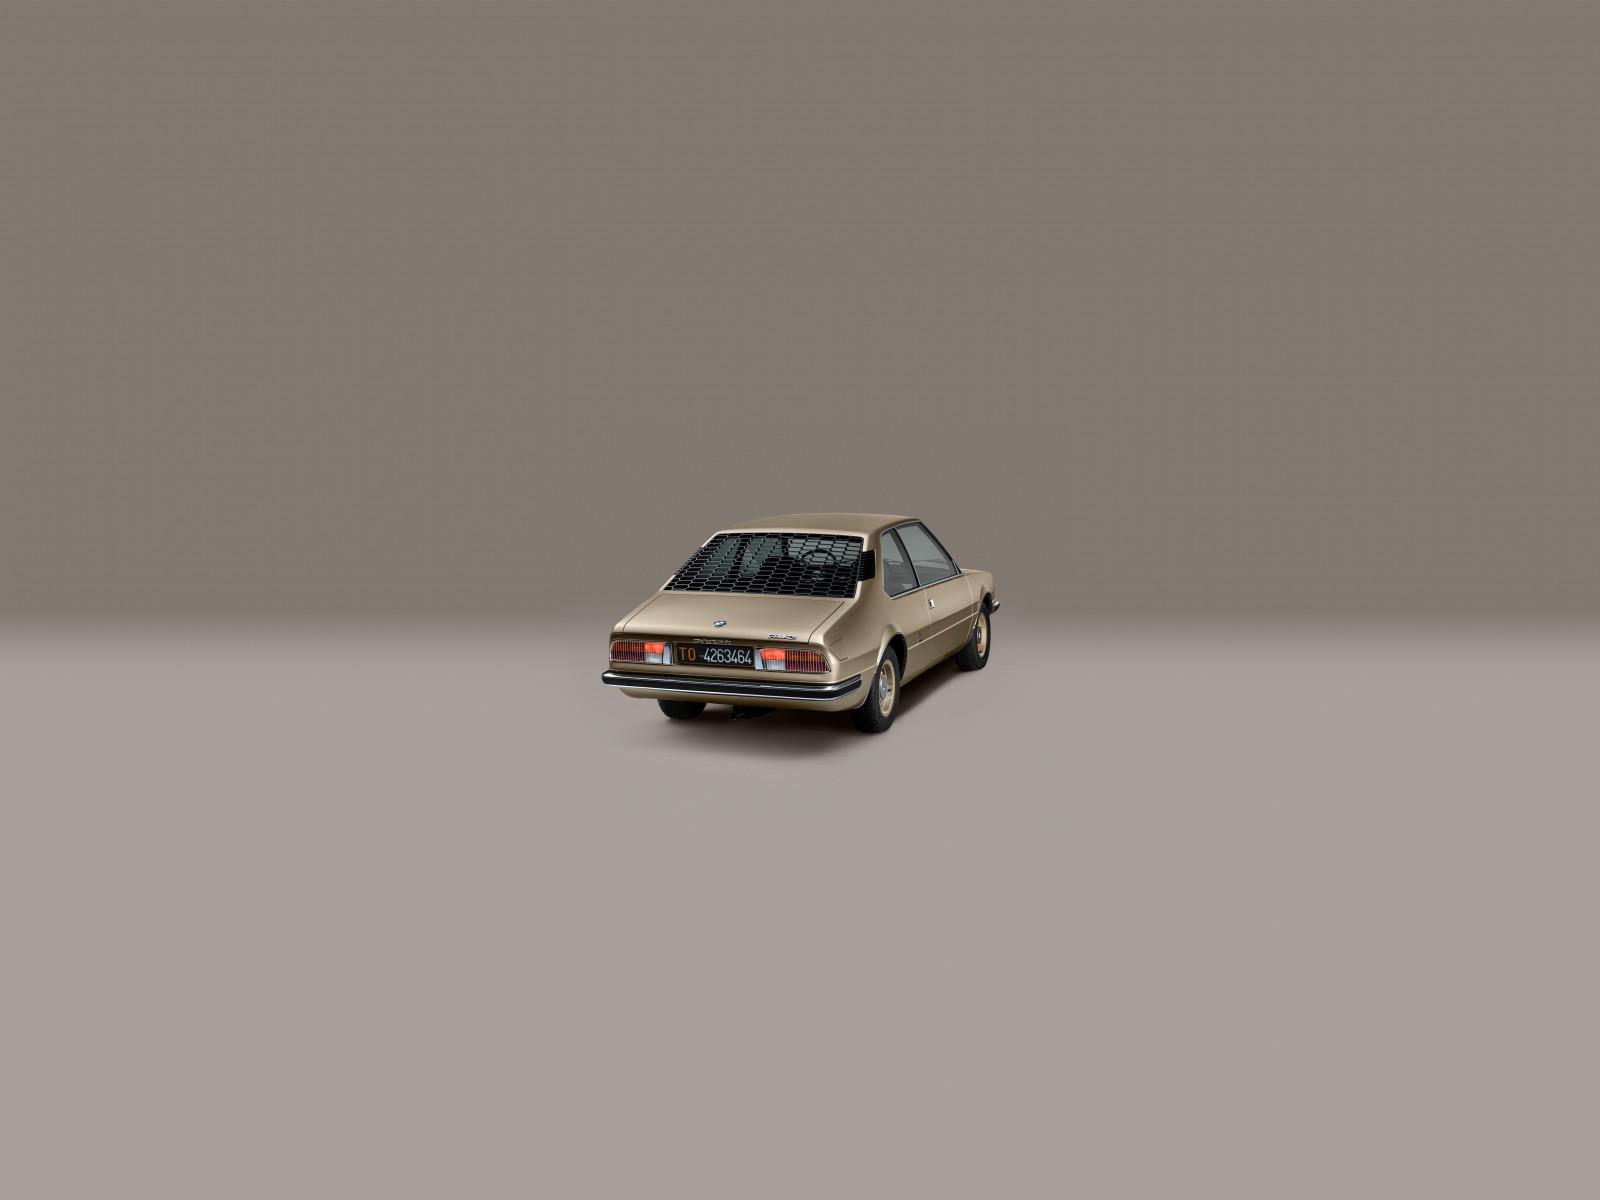 Wallpaper : BMW, old car, minimalism, gray background ...